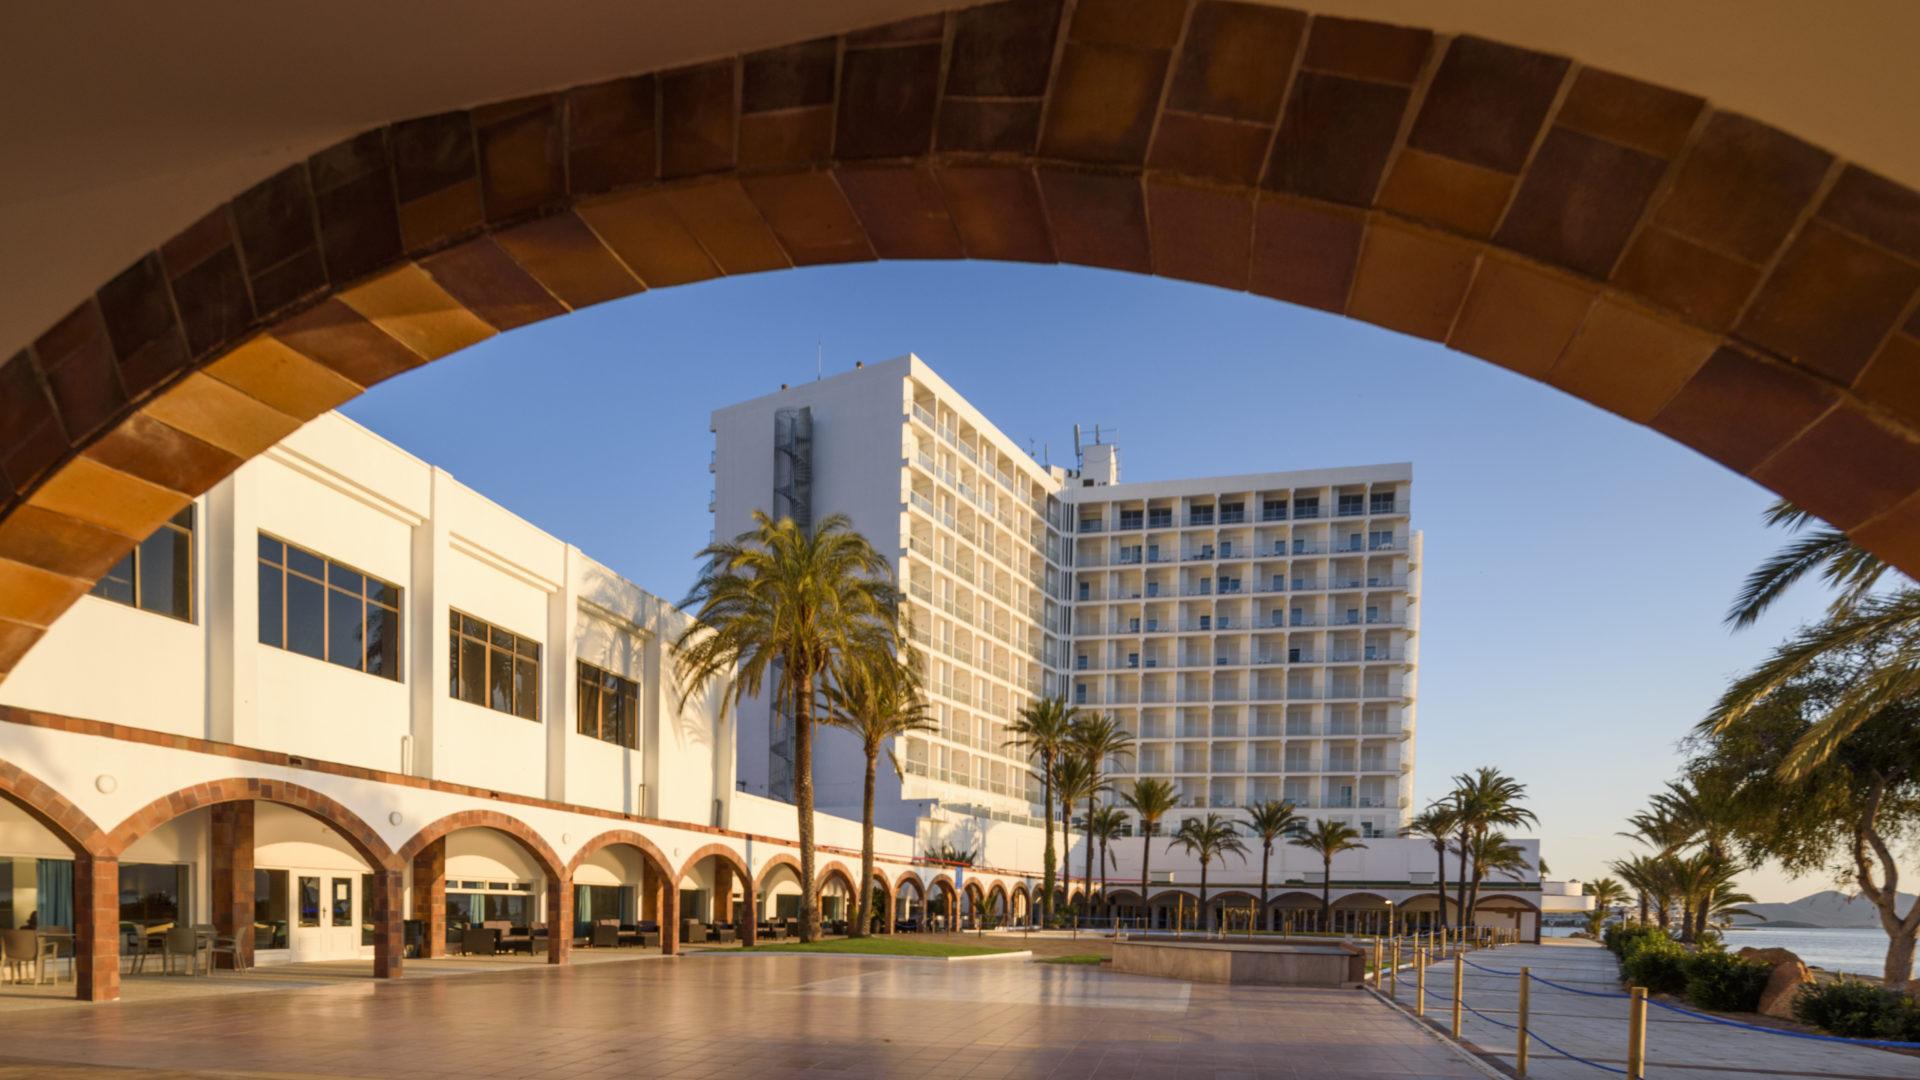 Hotel Doblemar-078-La Manga Urdecón